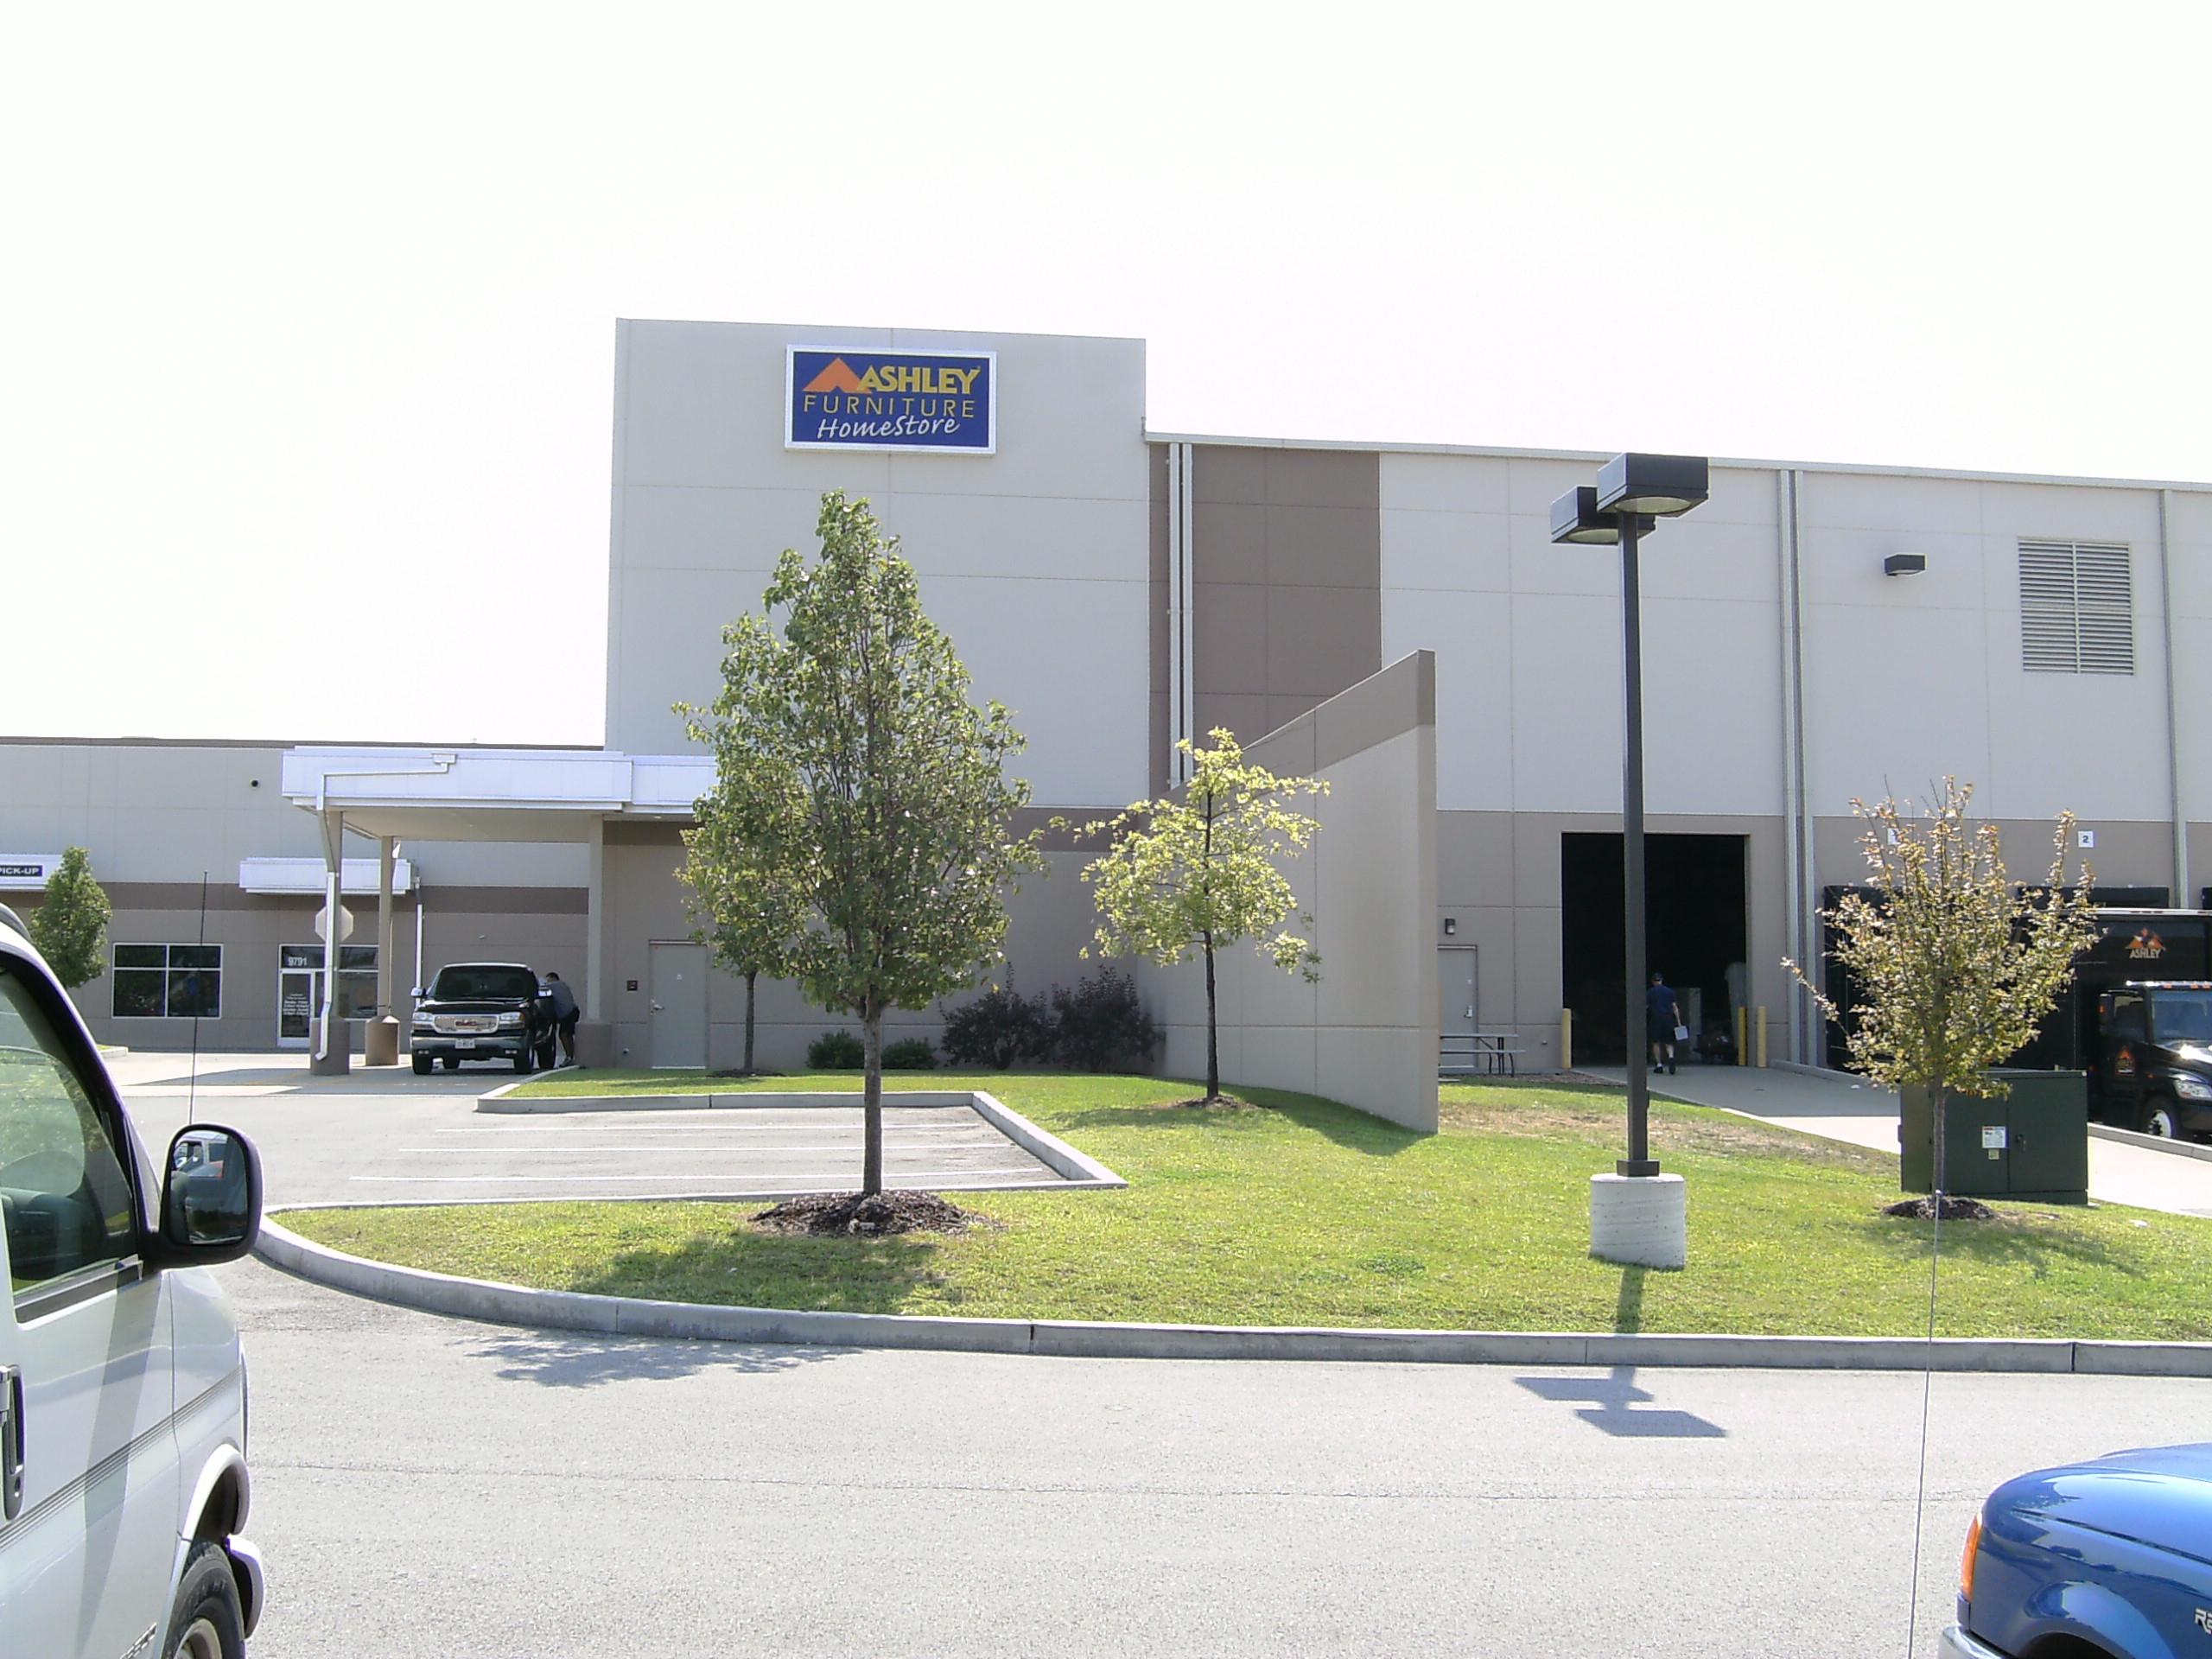 Ashley Furniture Distribution Center 9791 Green Park Industrial Dr Saint Louis Mo Furniture